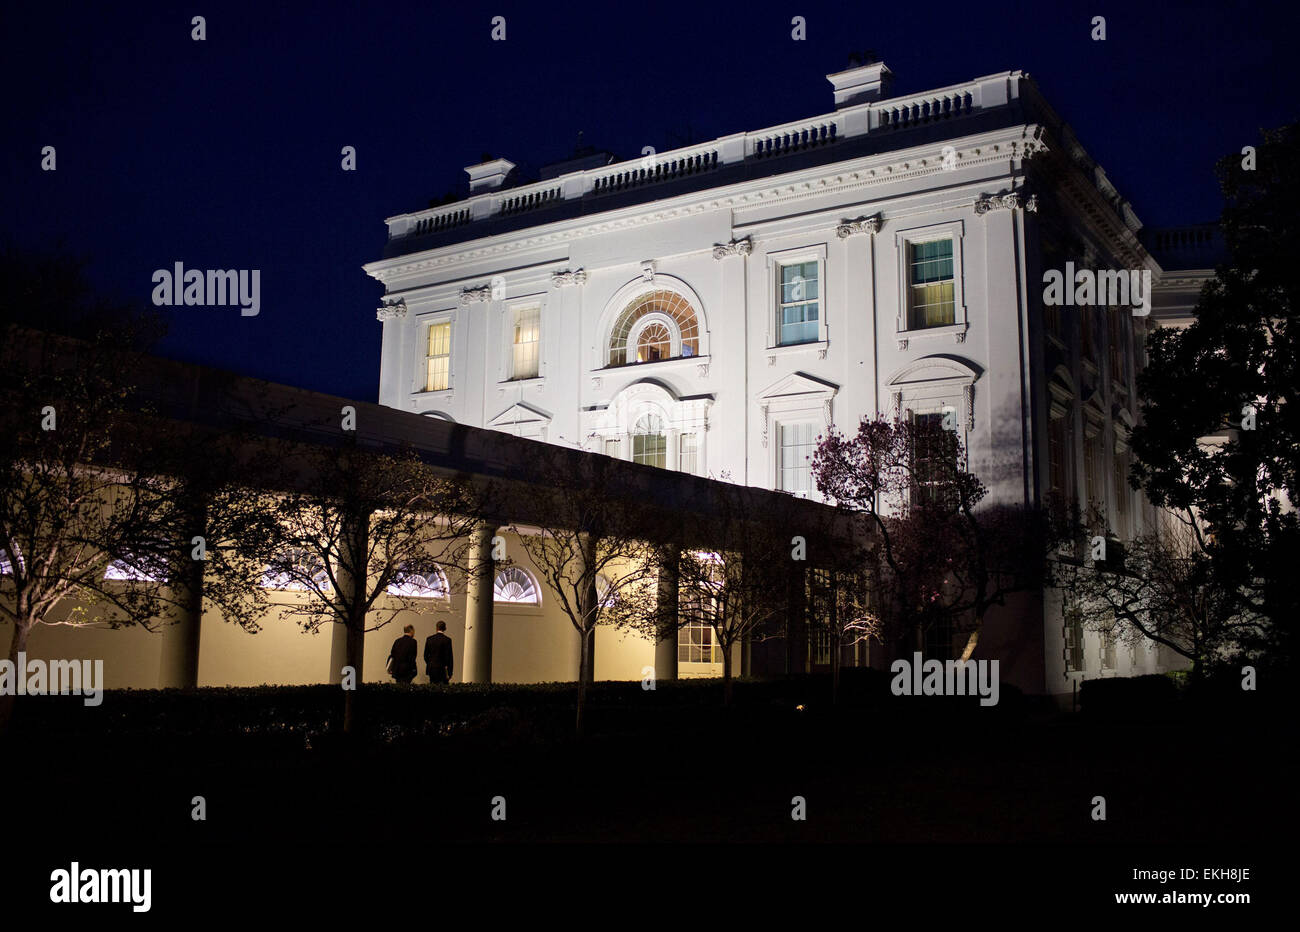 07.MARCH.2012. WASHINGTON D.C  PRESIDENT BARACK OBAMA AND NATIONAL SECURITY ADVISOR TOM DONILON WALK ALONG THE COLONNADE - Stock Image